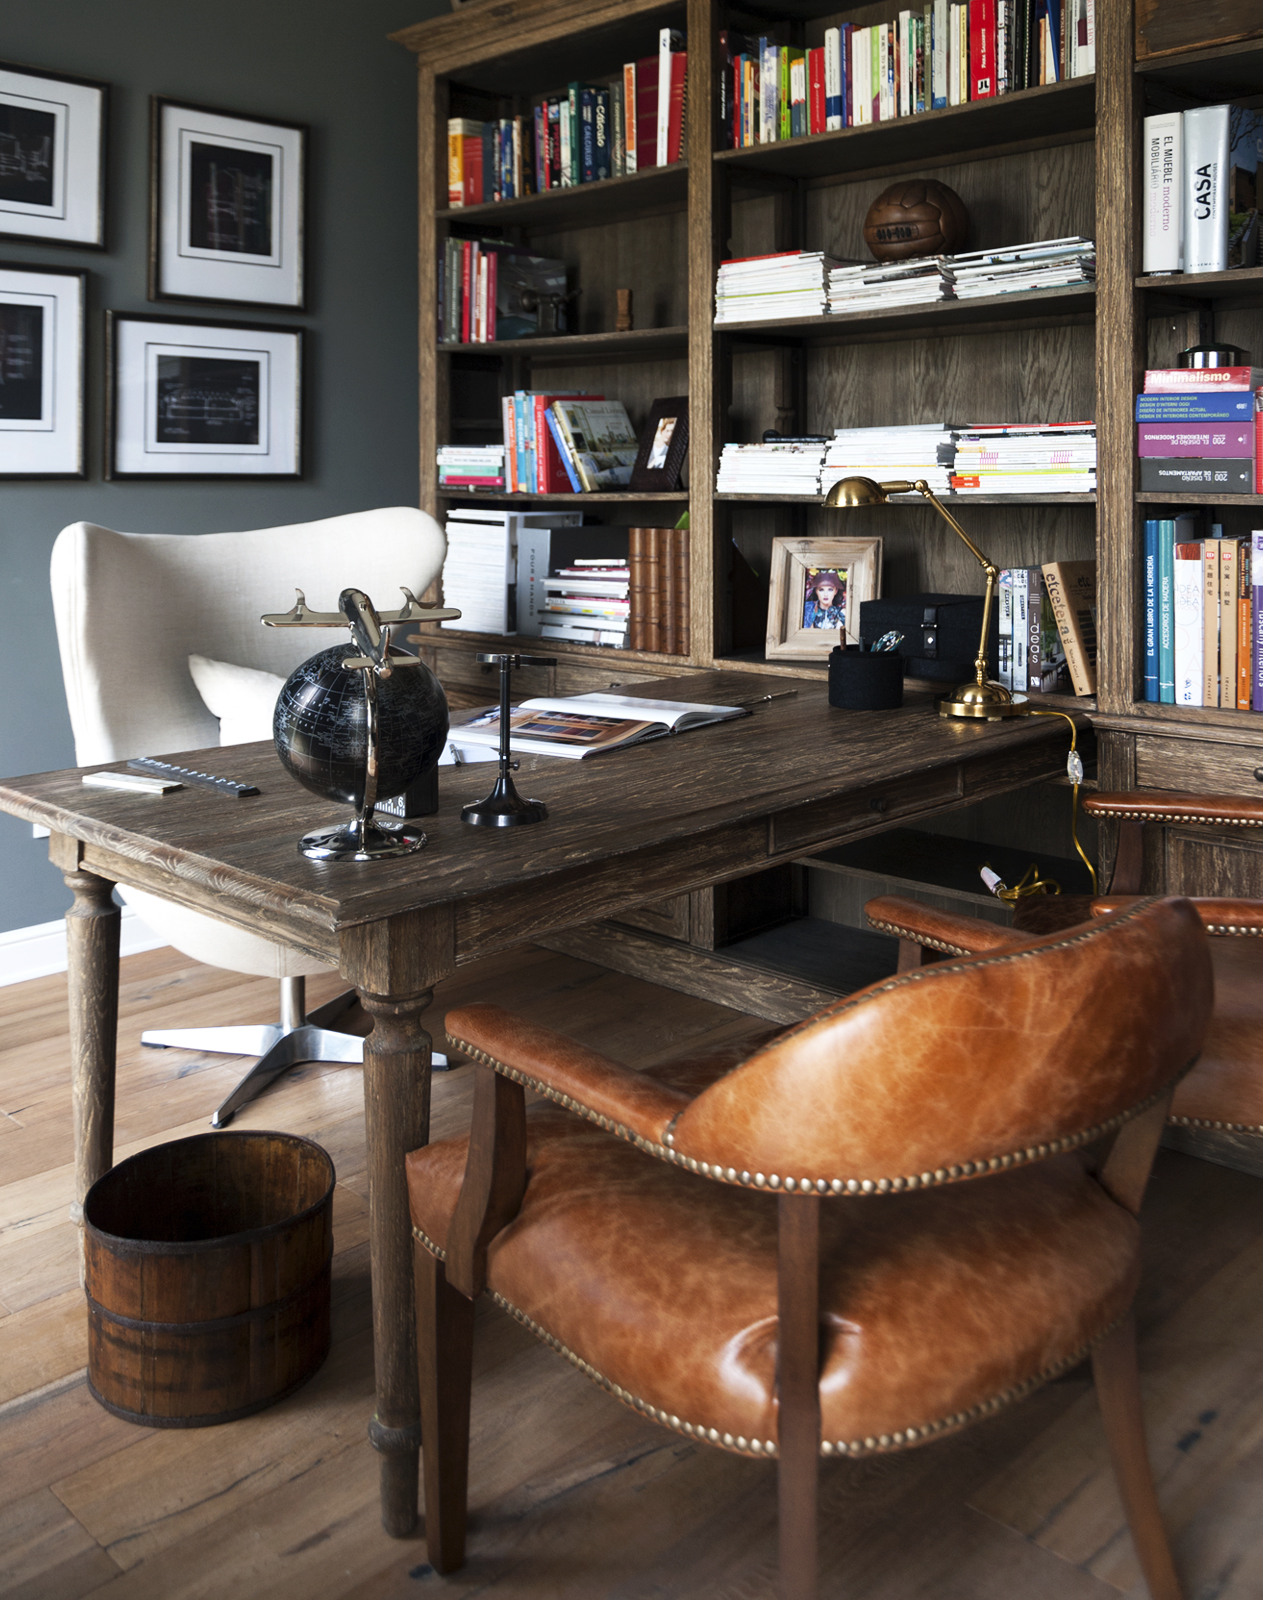 insignias-interiorismo-arquitectura-vintage-casa-ef-sofis-home-3